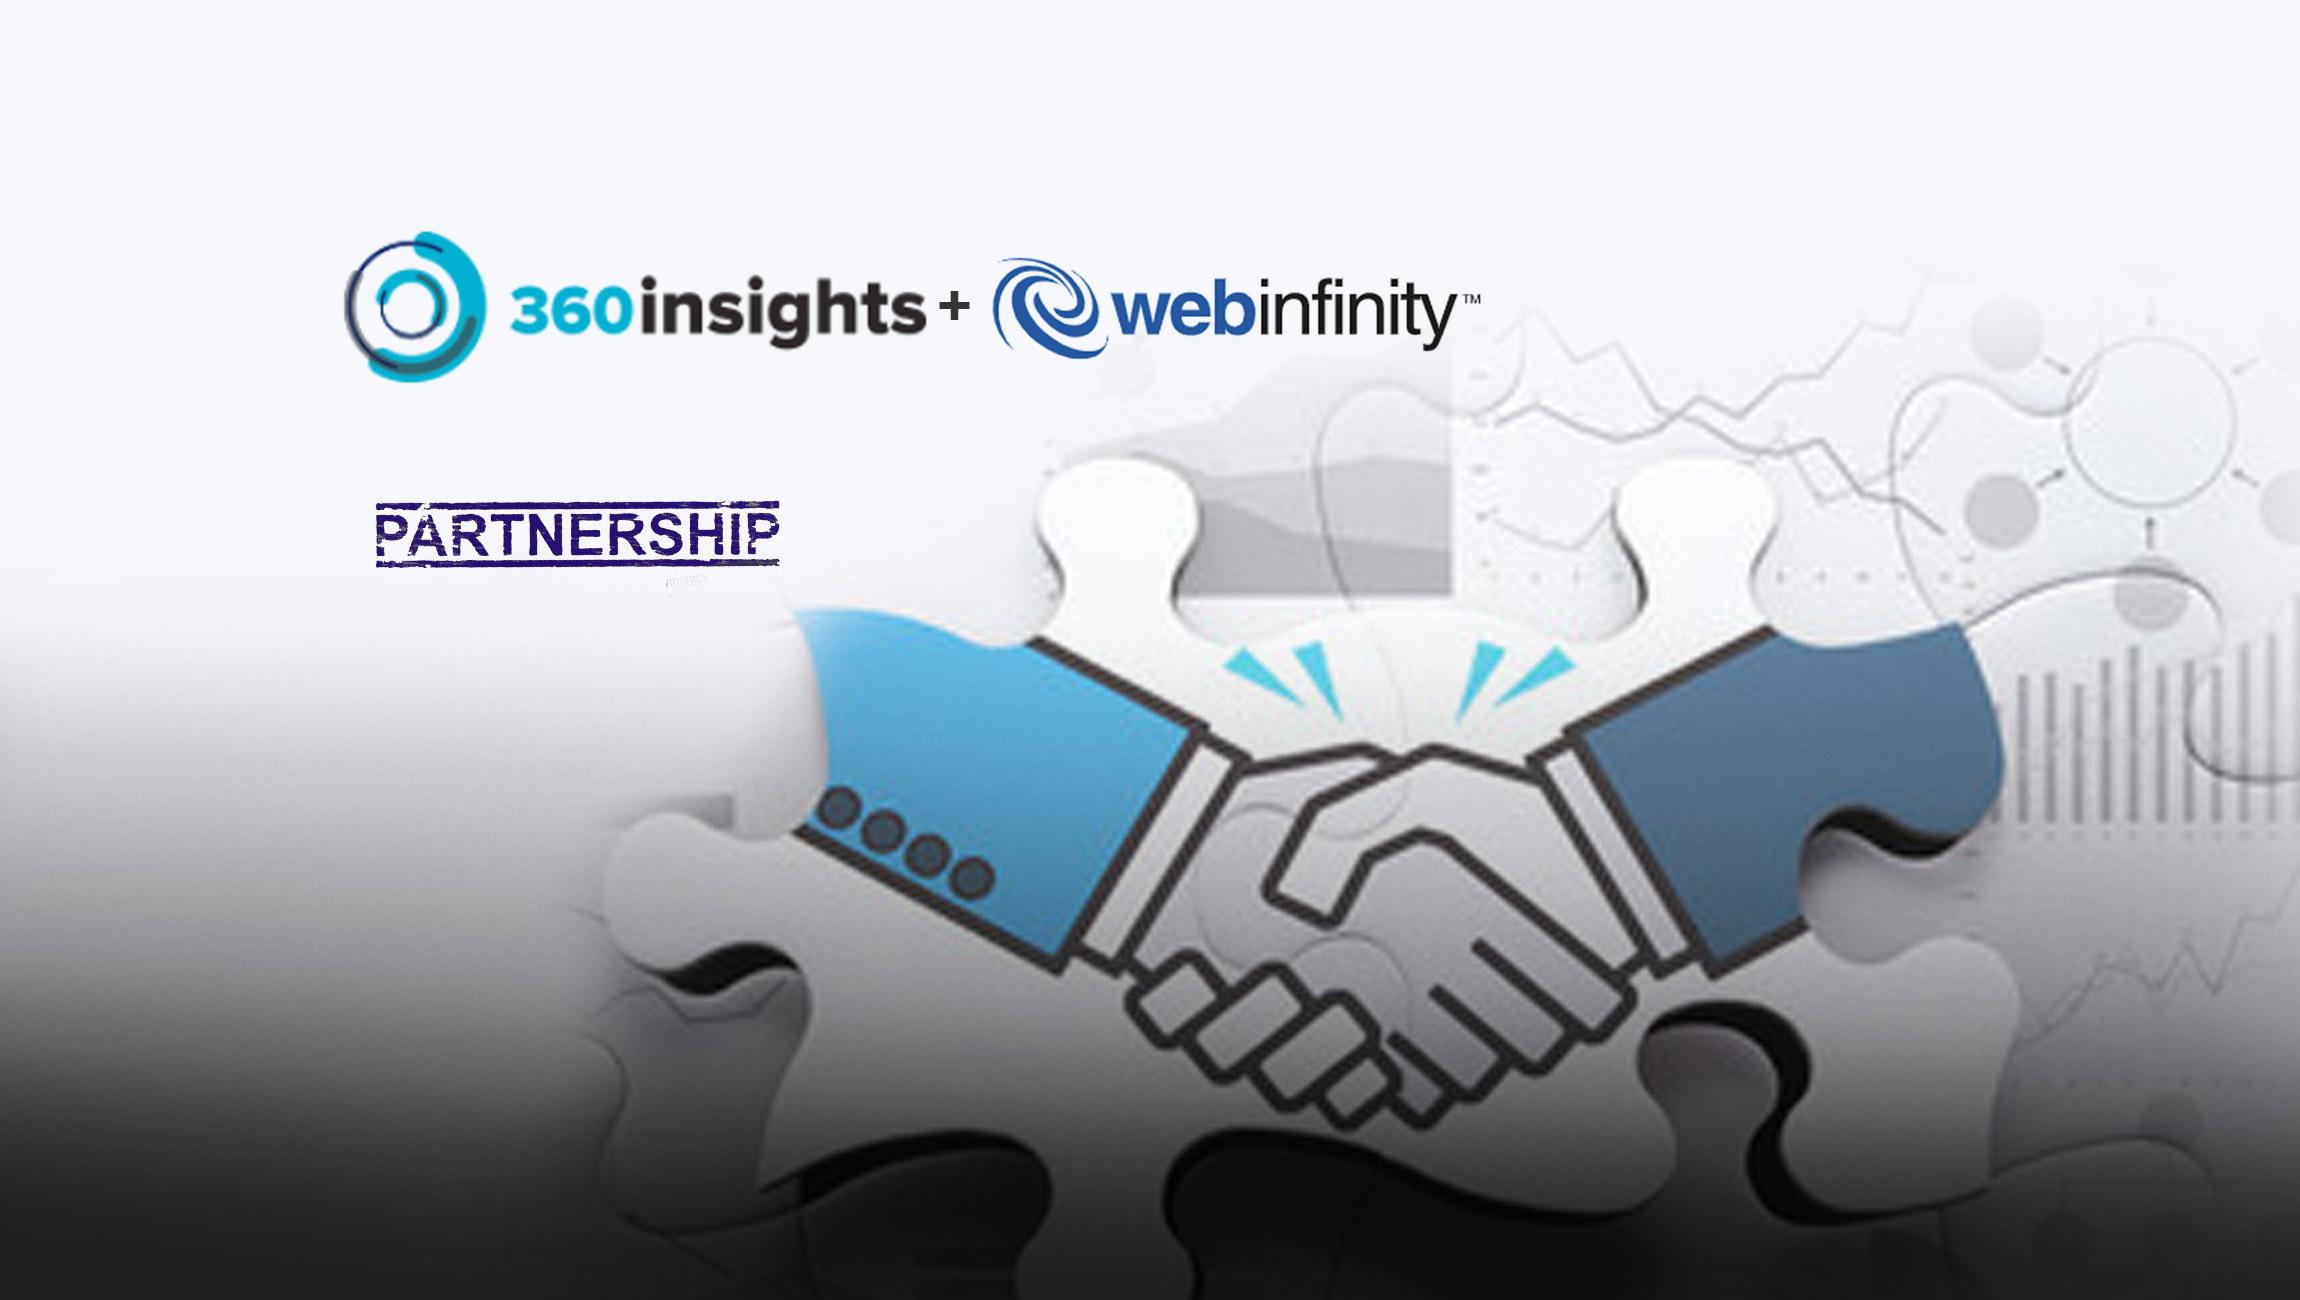 360insights and Webinfinity Form Strategic Partnership